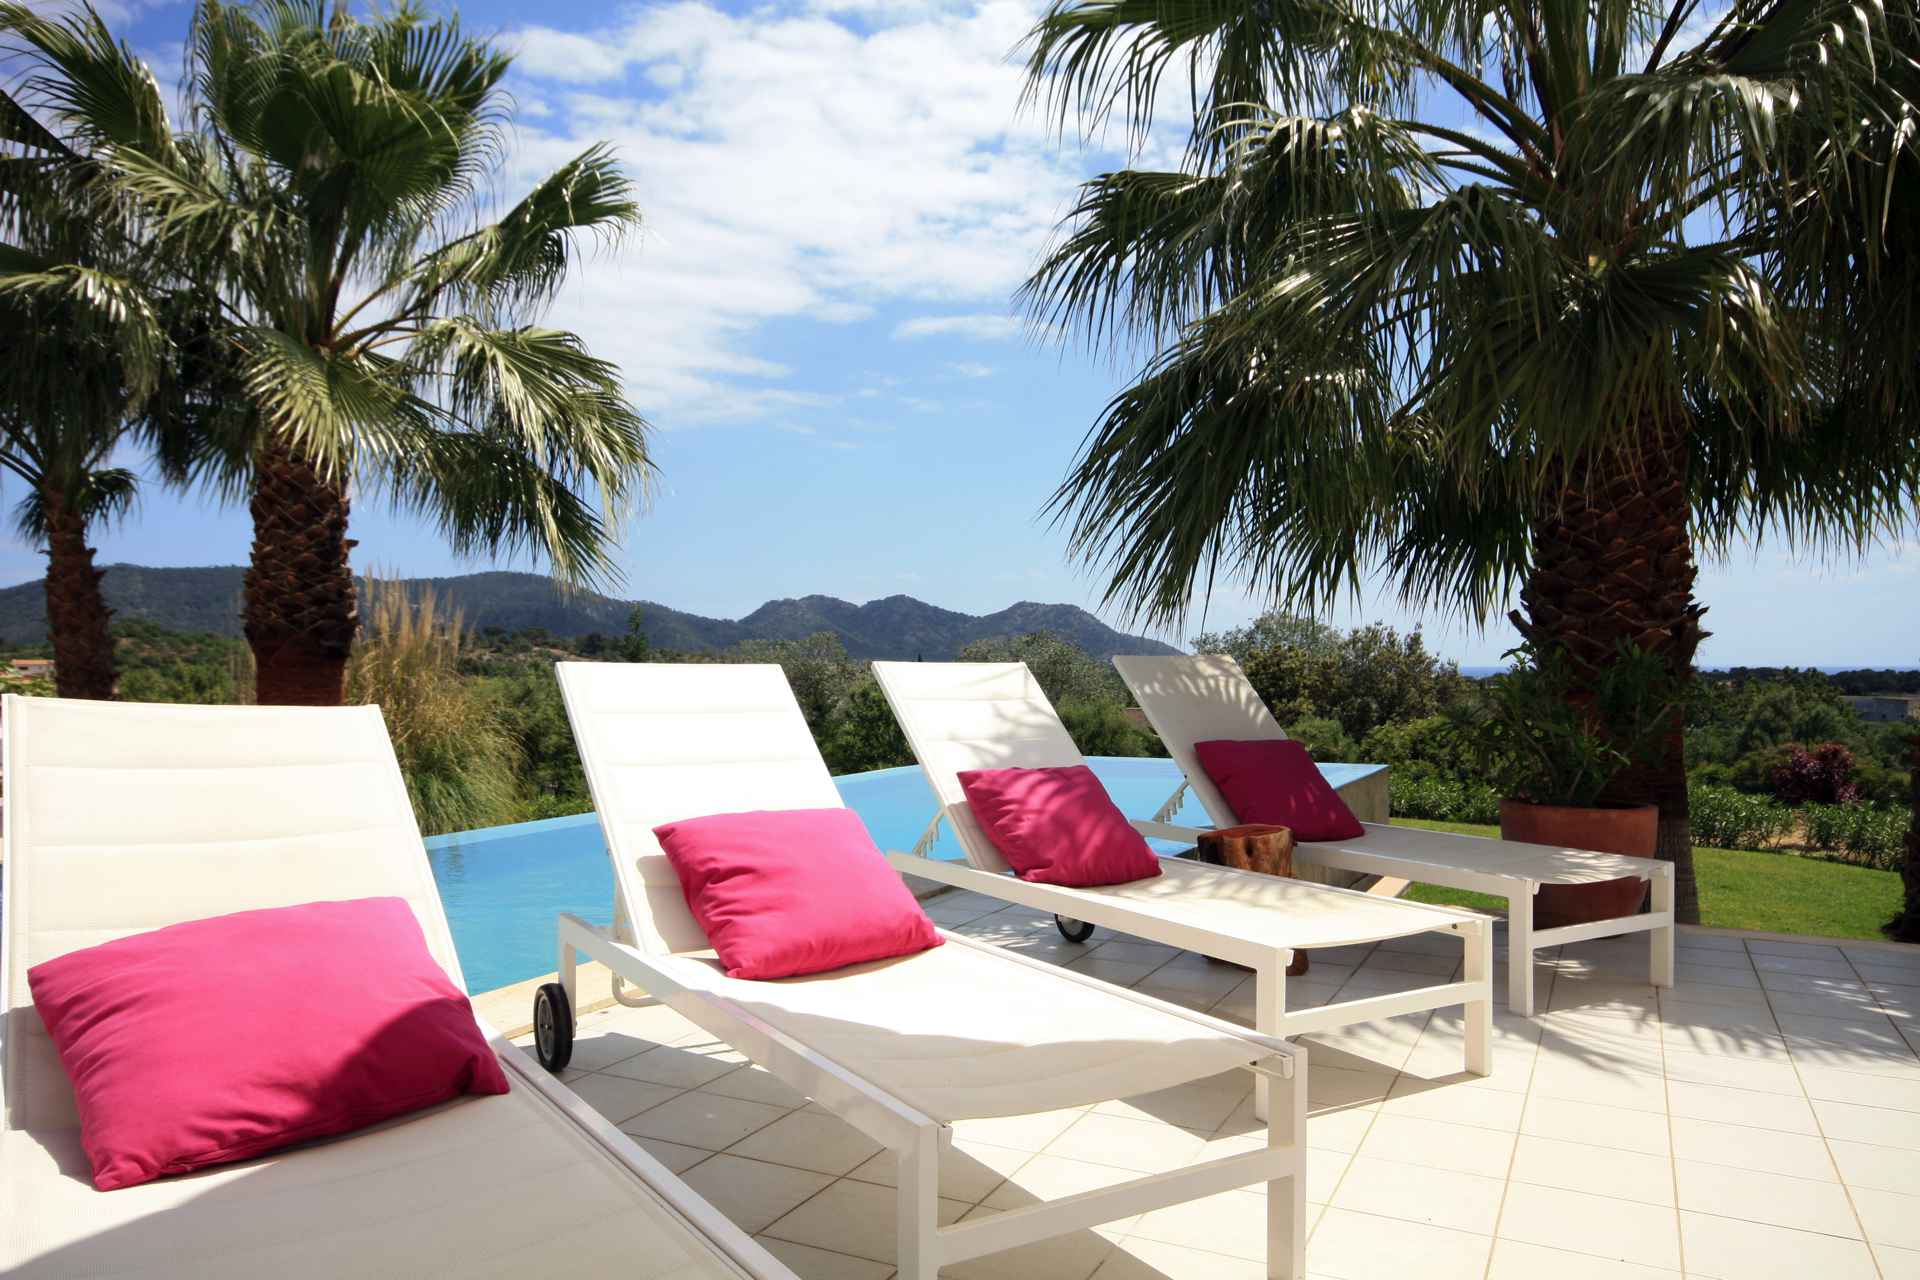 01-28 Luxus Finca Mallorca Nordosten Bild 13